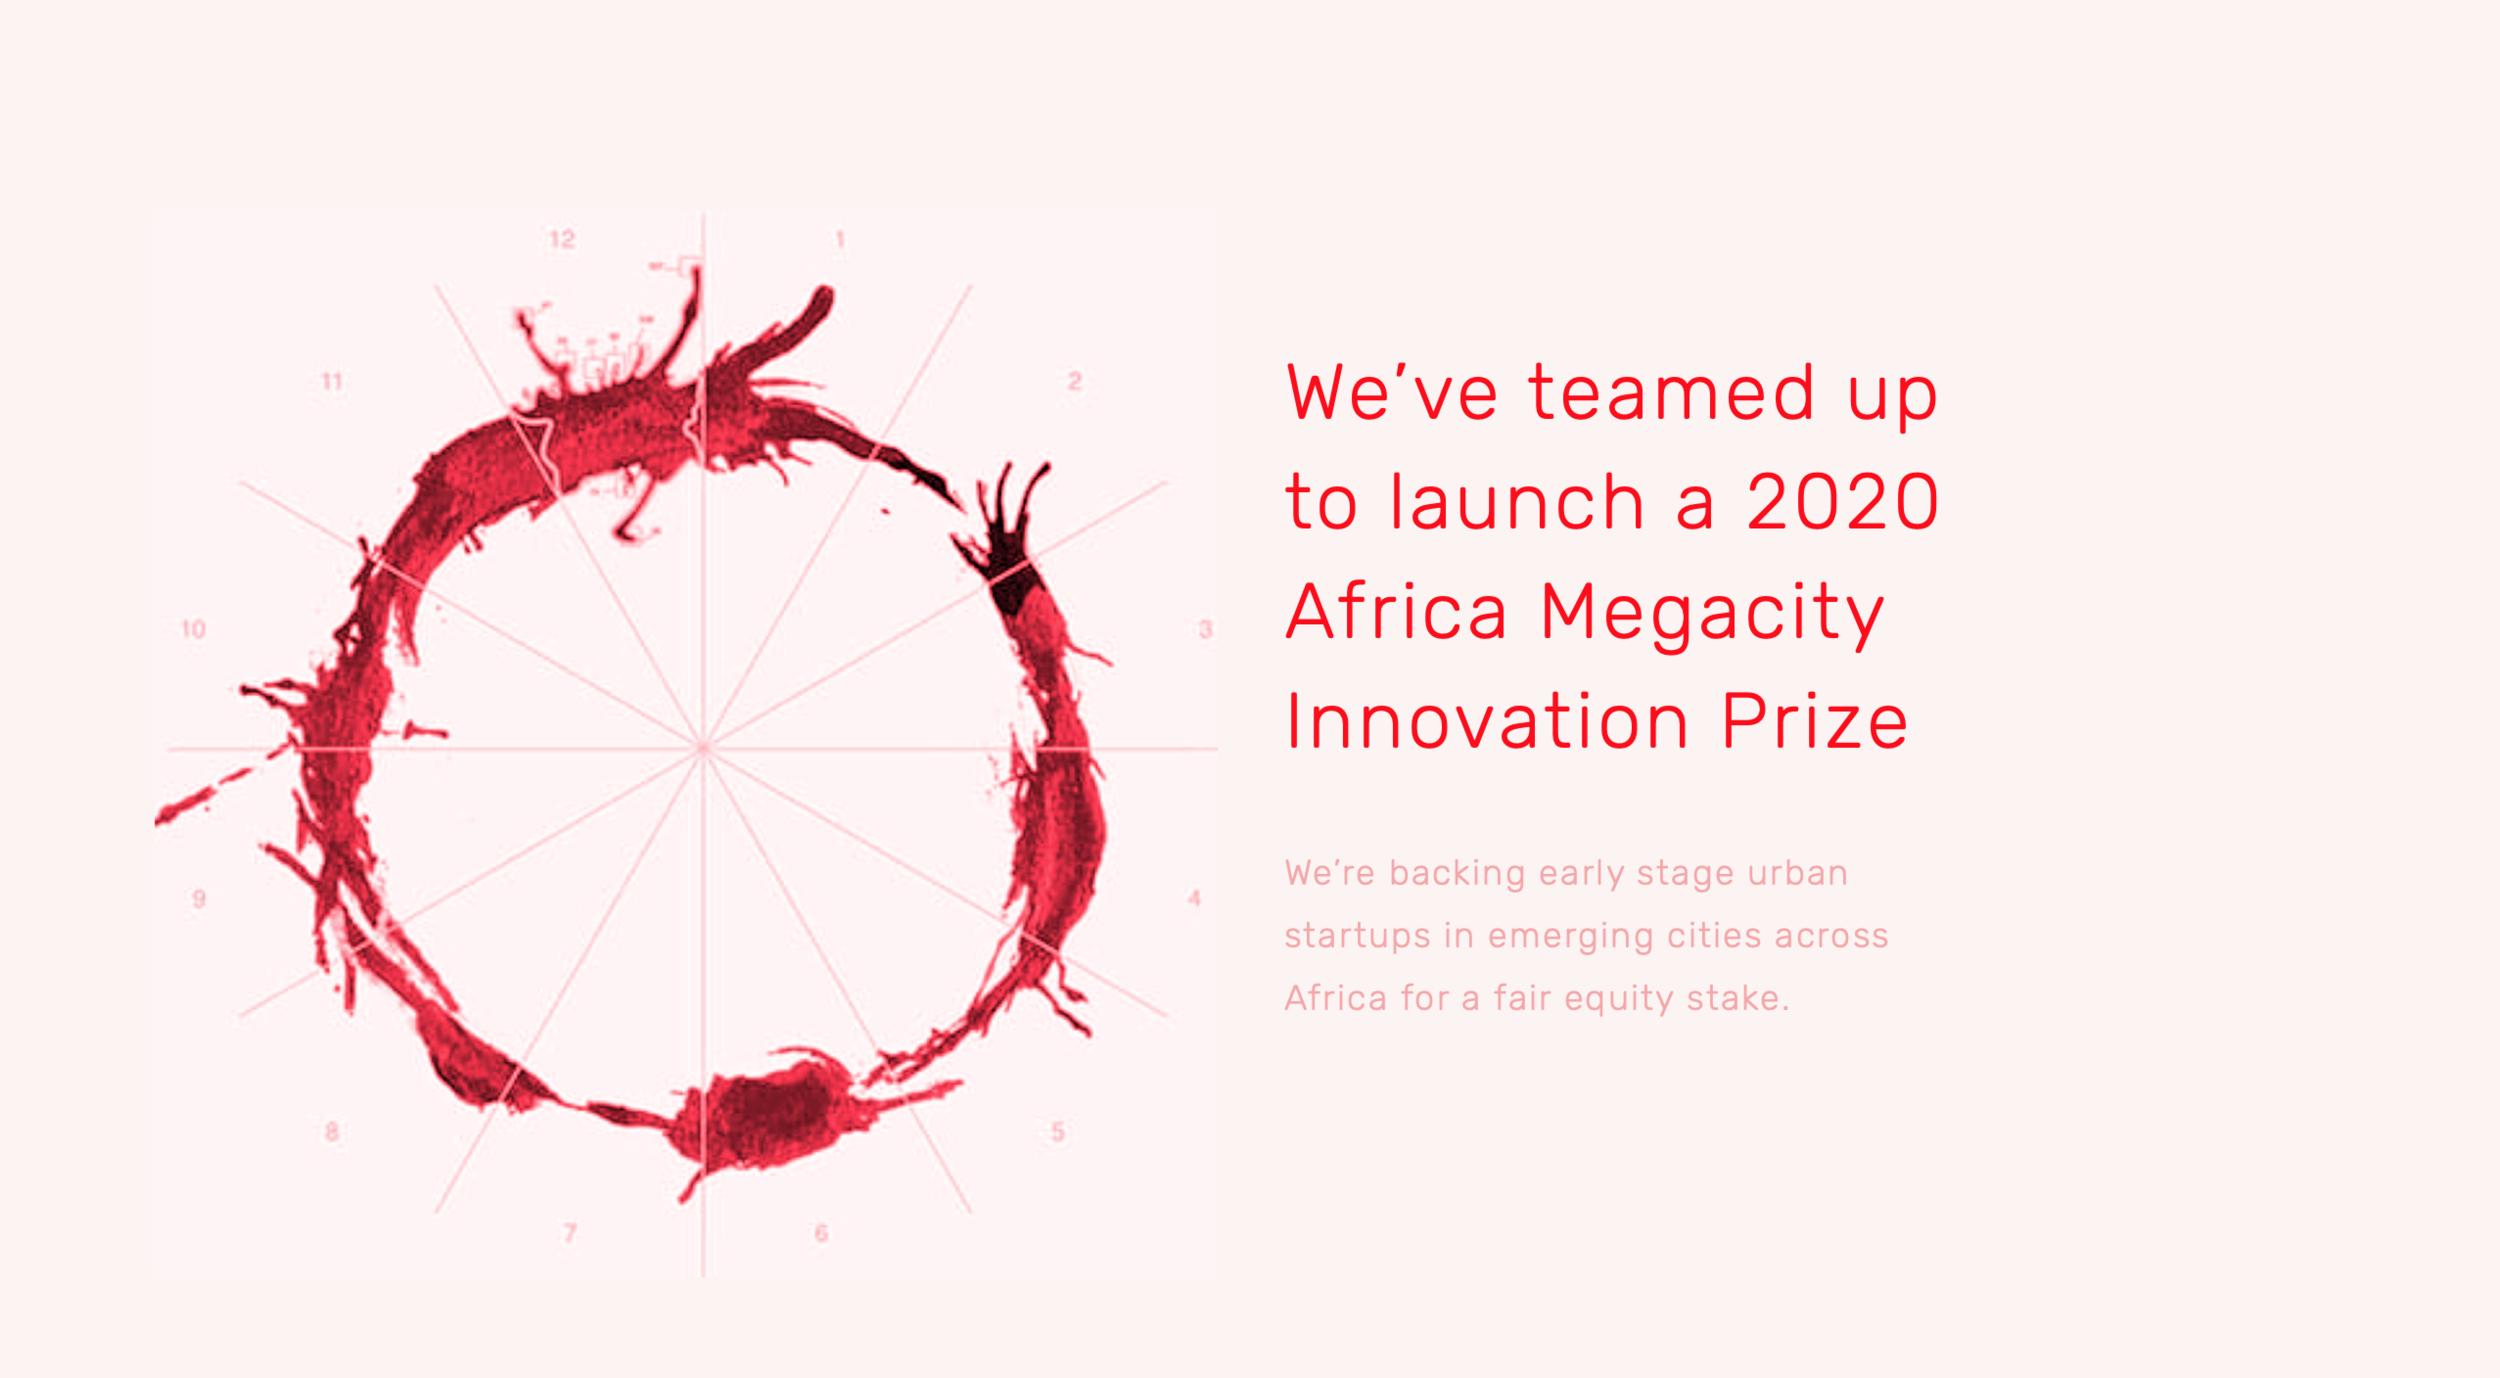 Press Release - Africa Megacity Prize